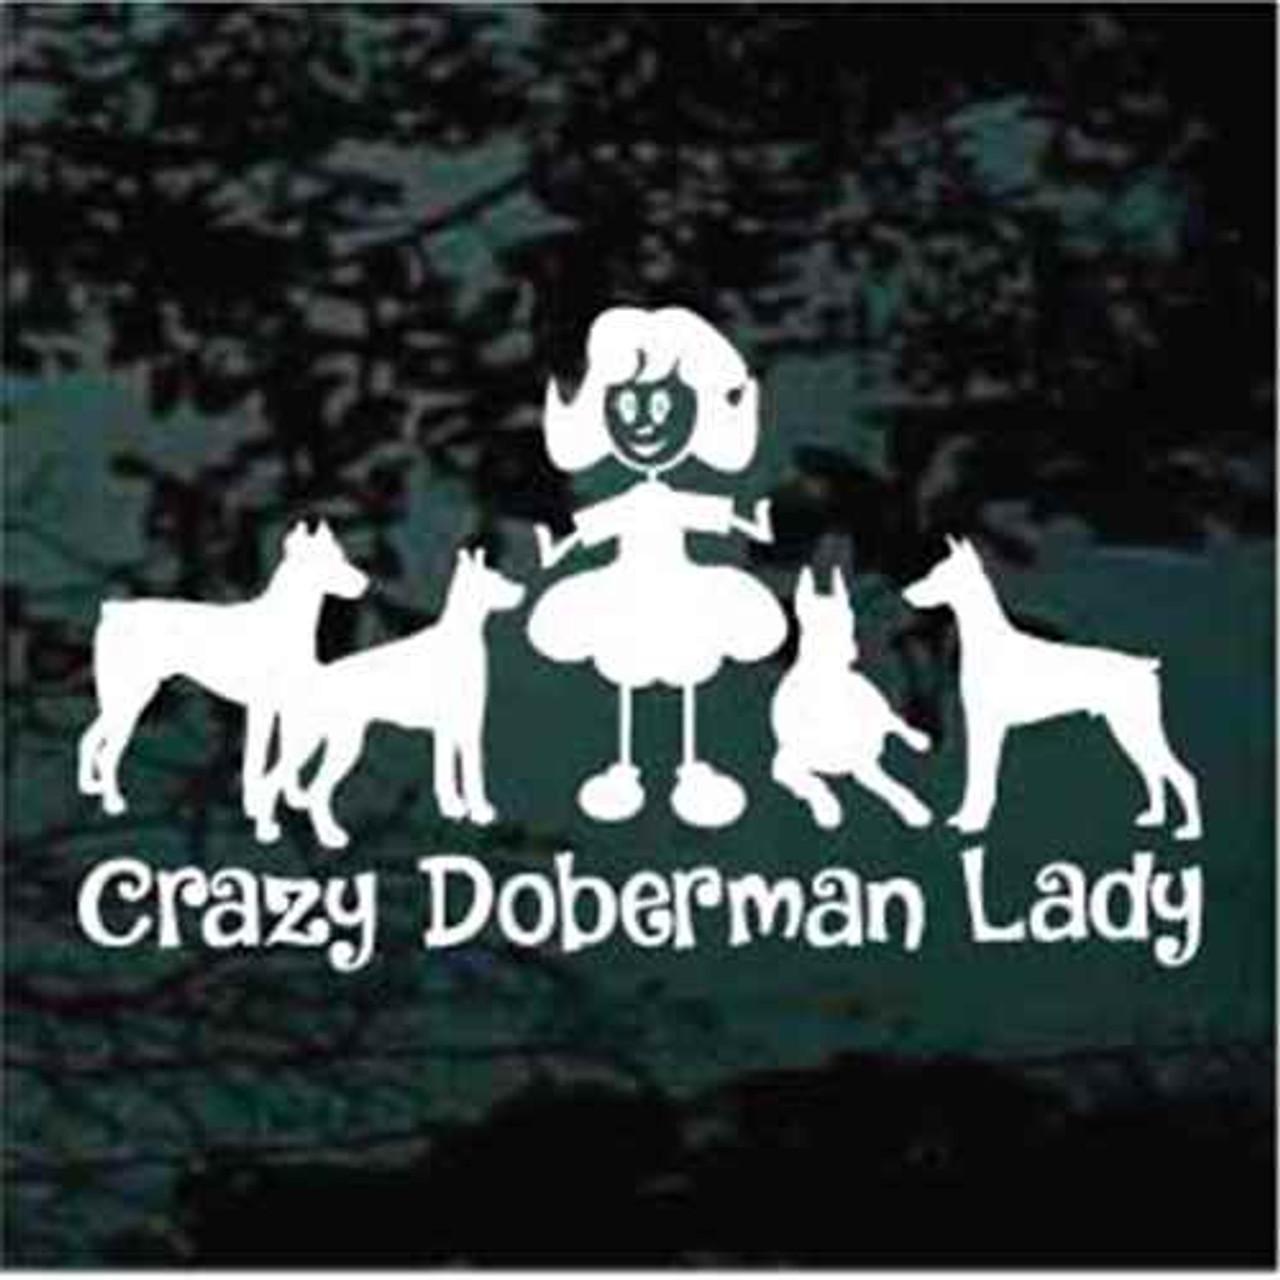 Crazy doberman lady car window decal